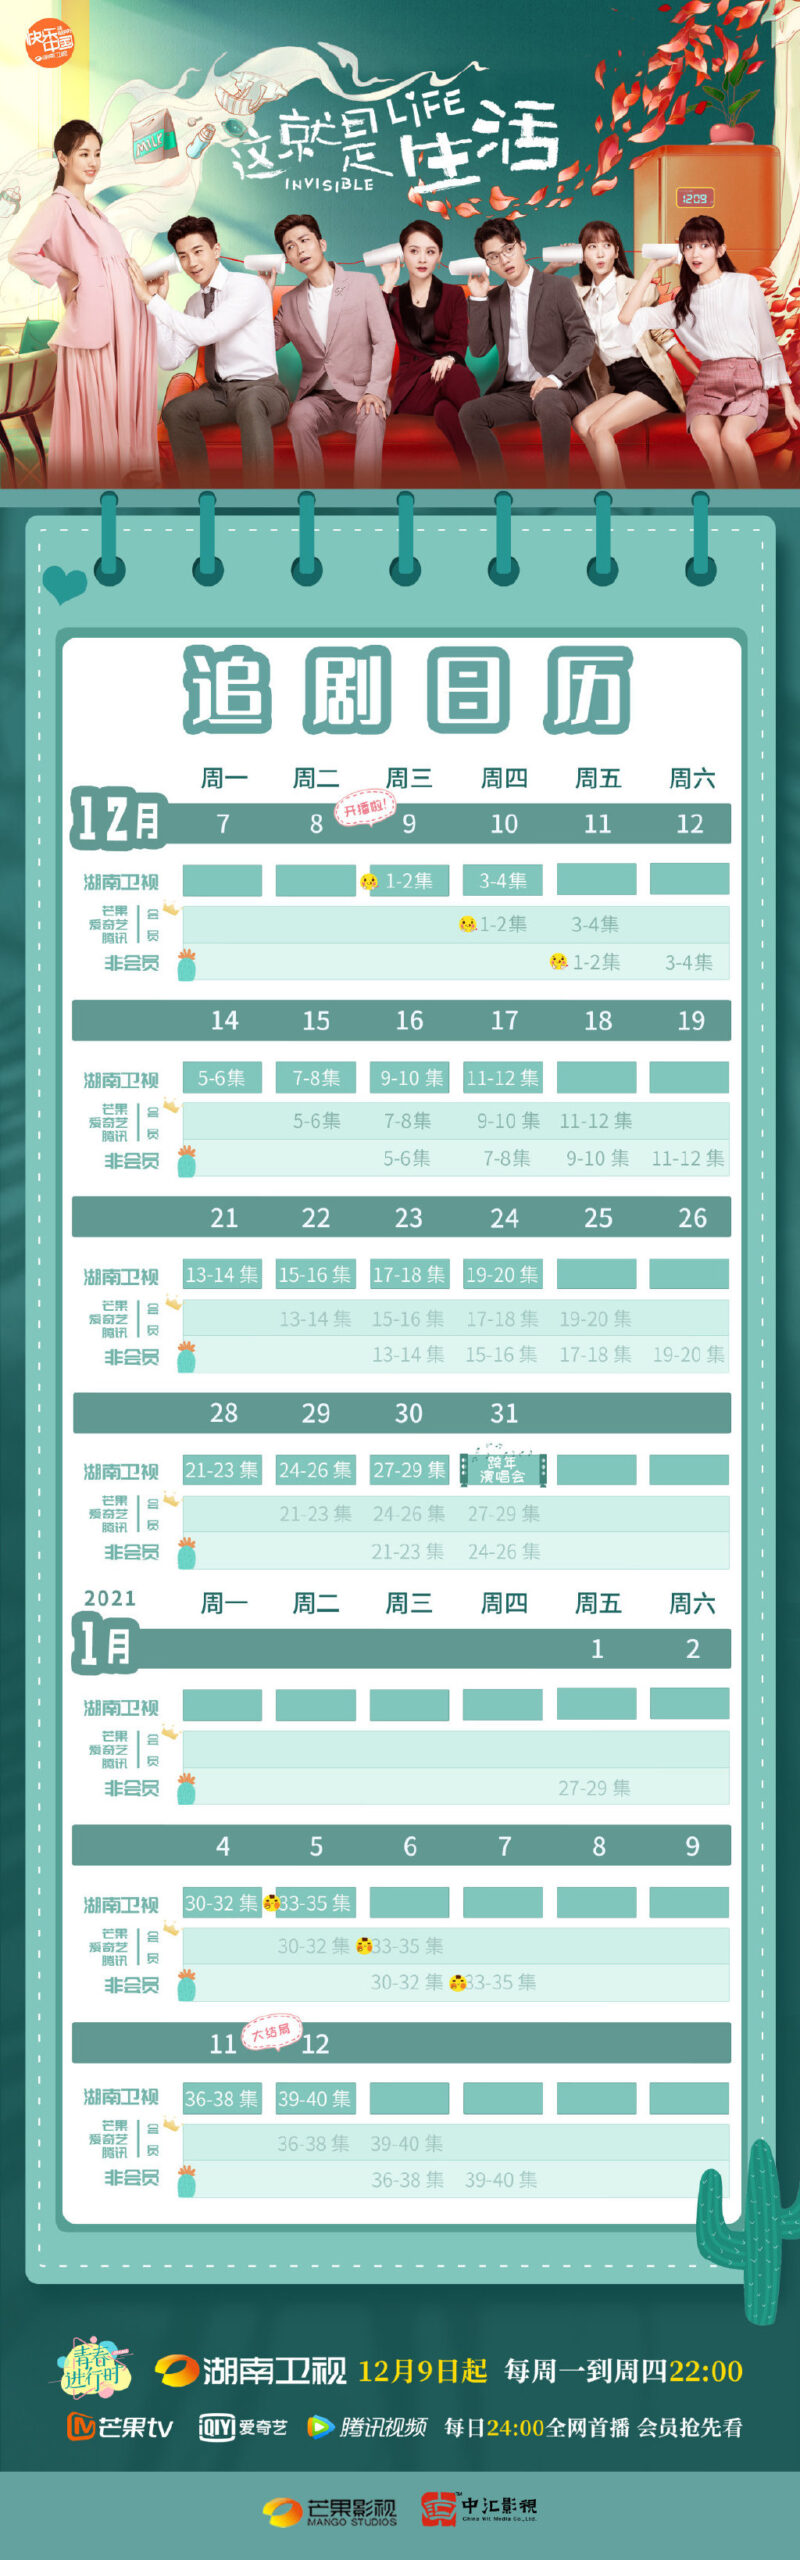 Invisible Life Chinese Drama Airing Calendar